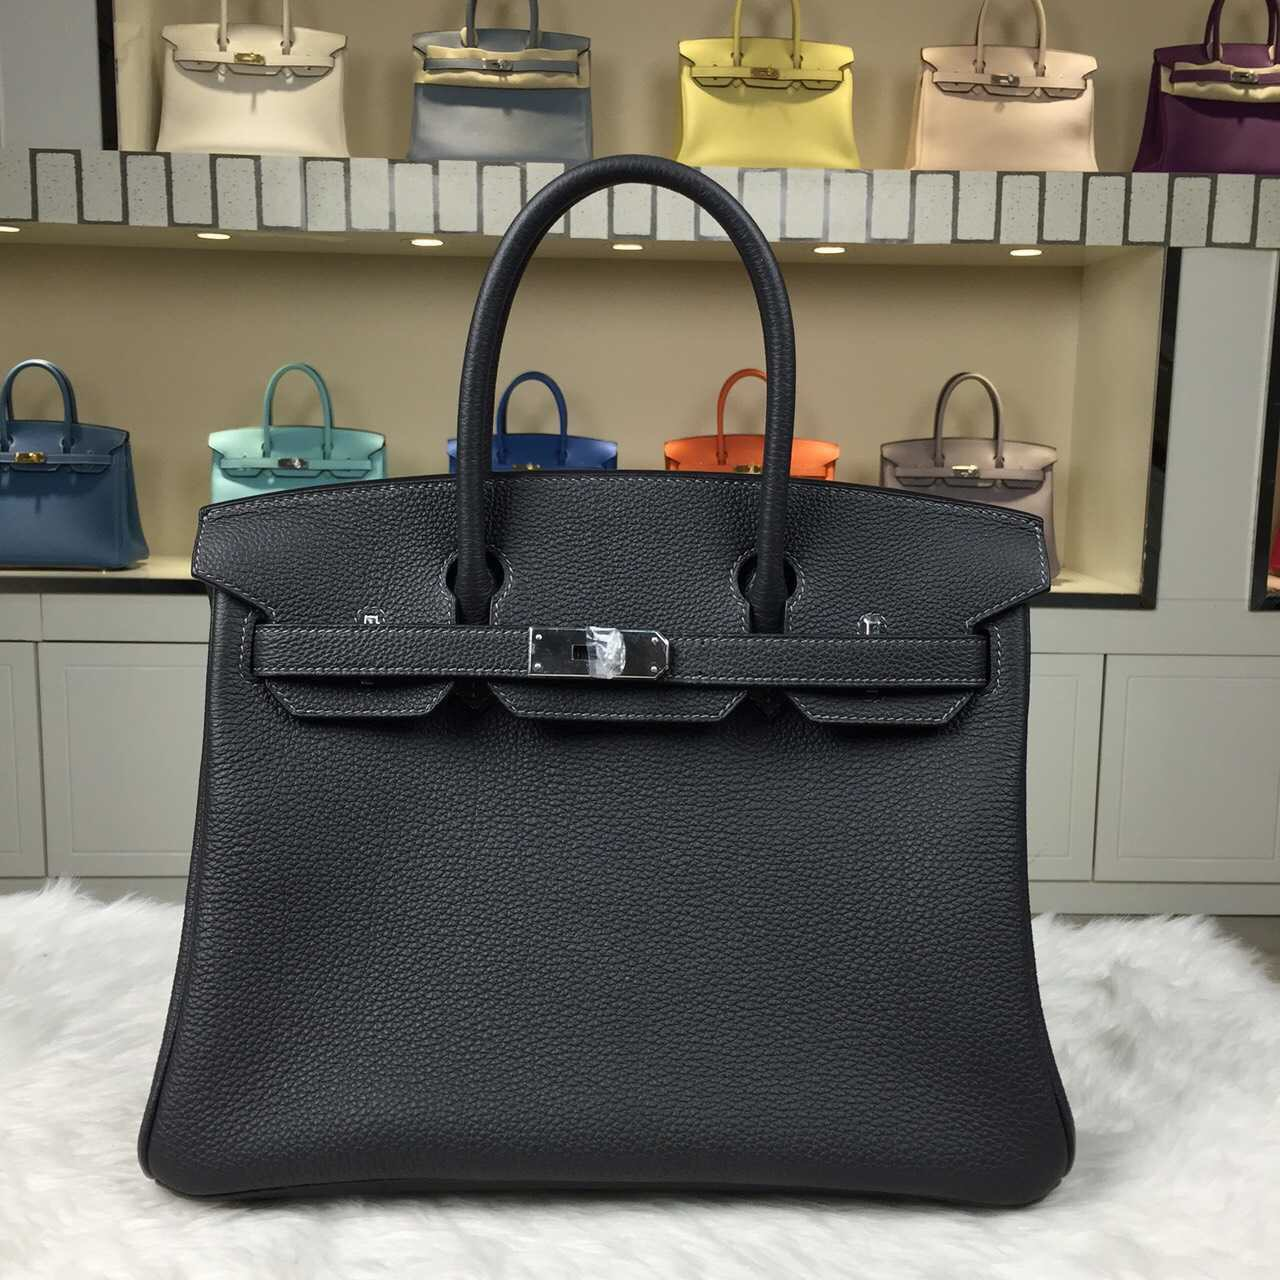 New Hermes Bag CK84 Graphite Grey Togo Calfskin Leather Birkin30cm